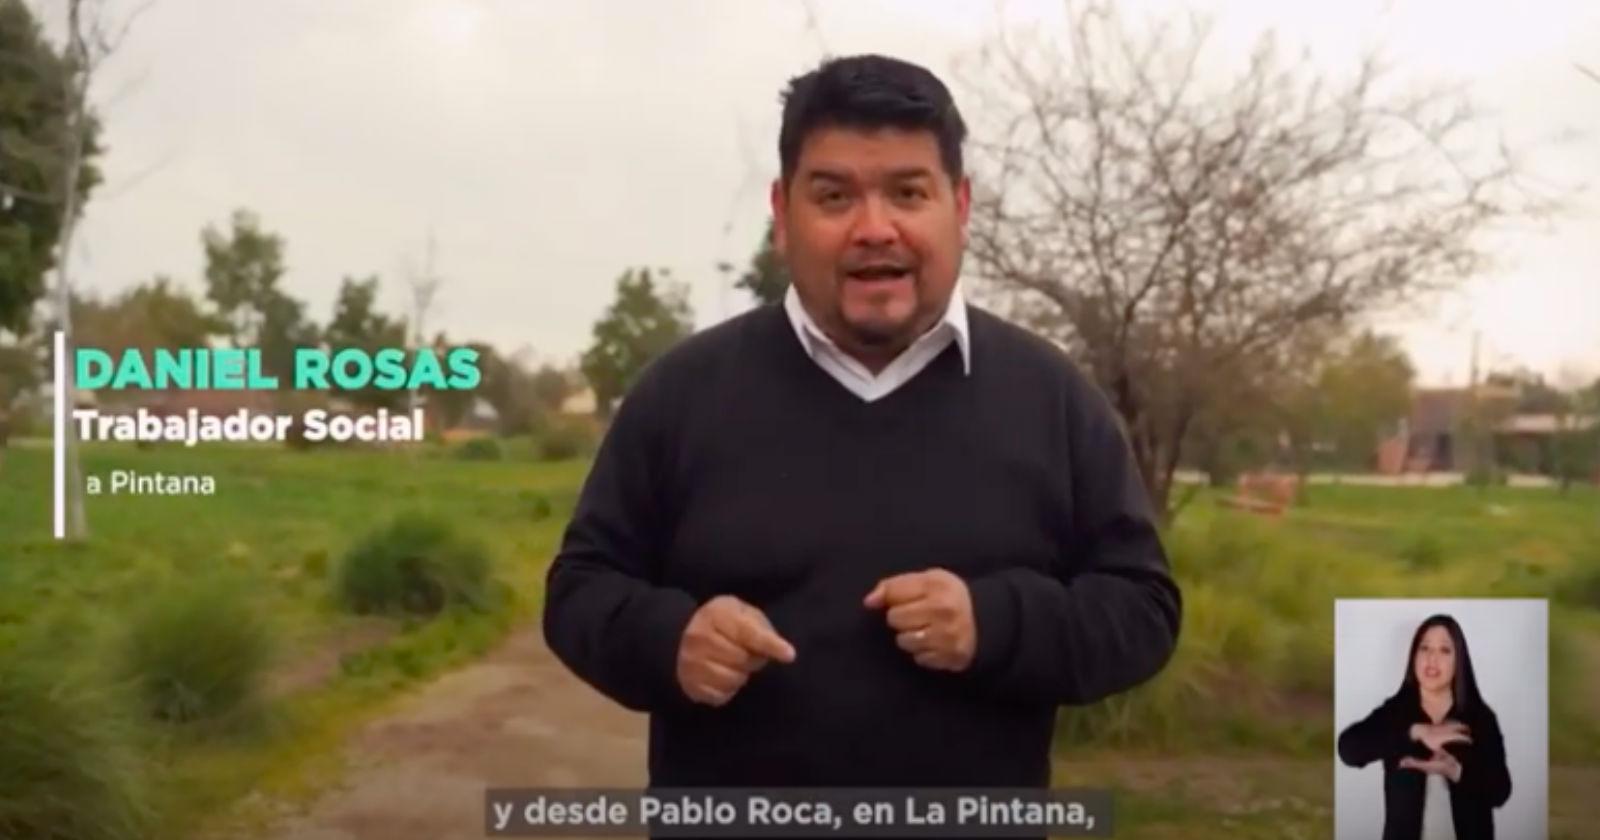 El error en video de la UDI en franja electoral que causó la molestia de la alcaldesa de La Pintana